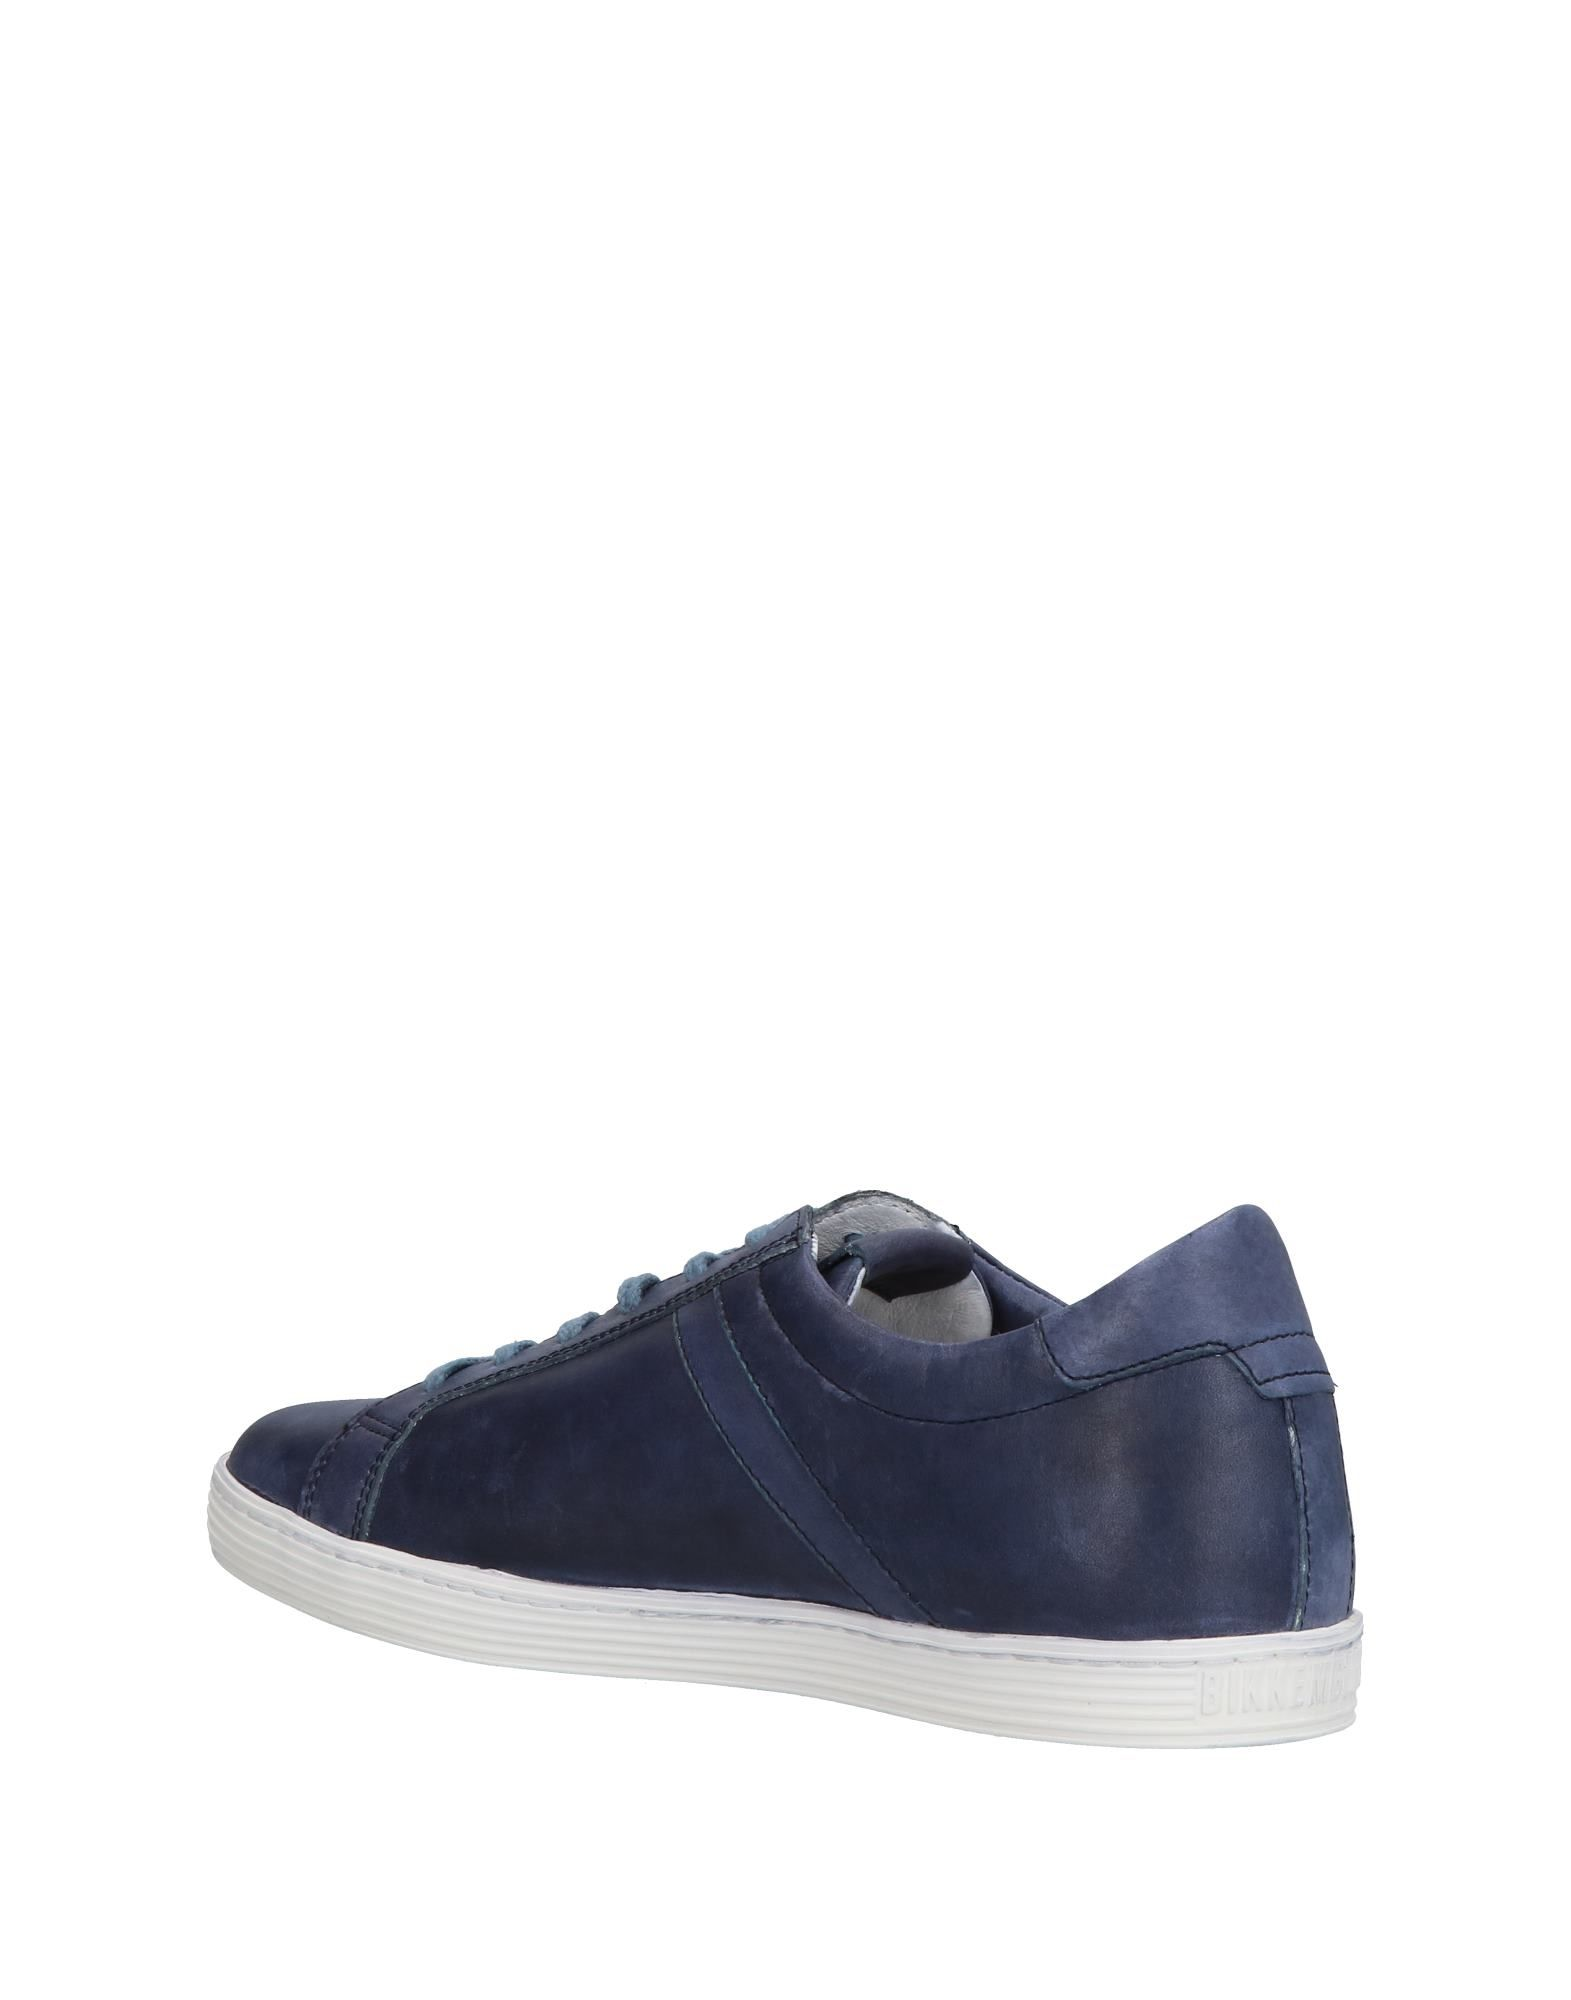 A buon mercato Sneakers Bikkembergs Uomo - 11326265IP